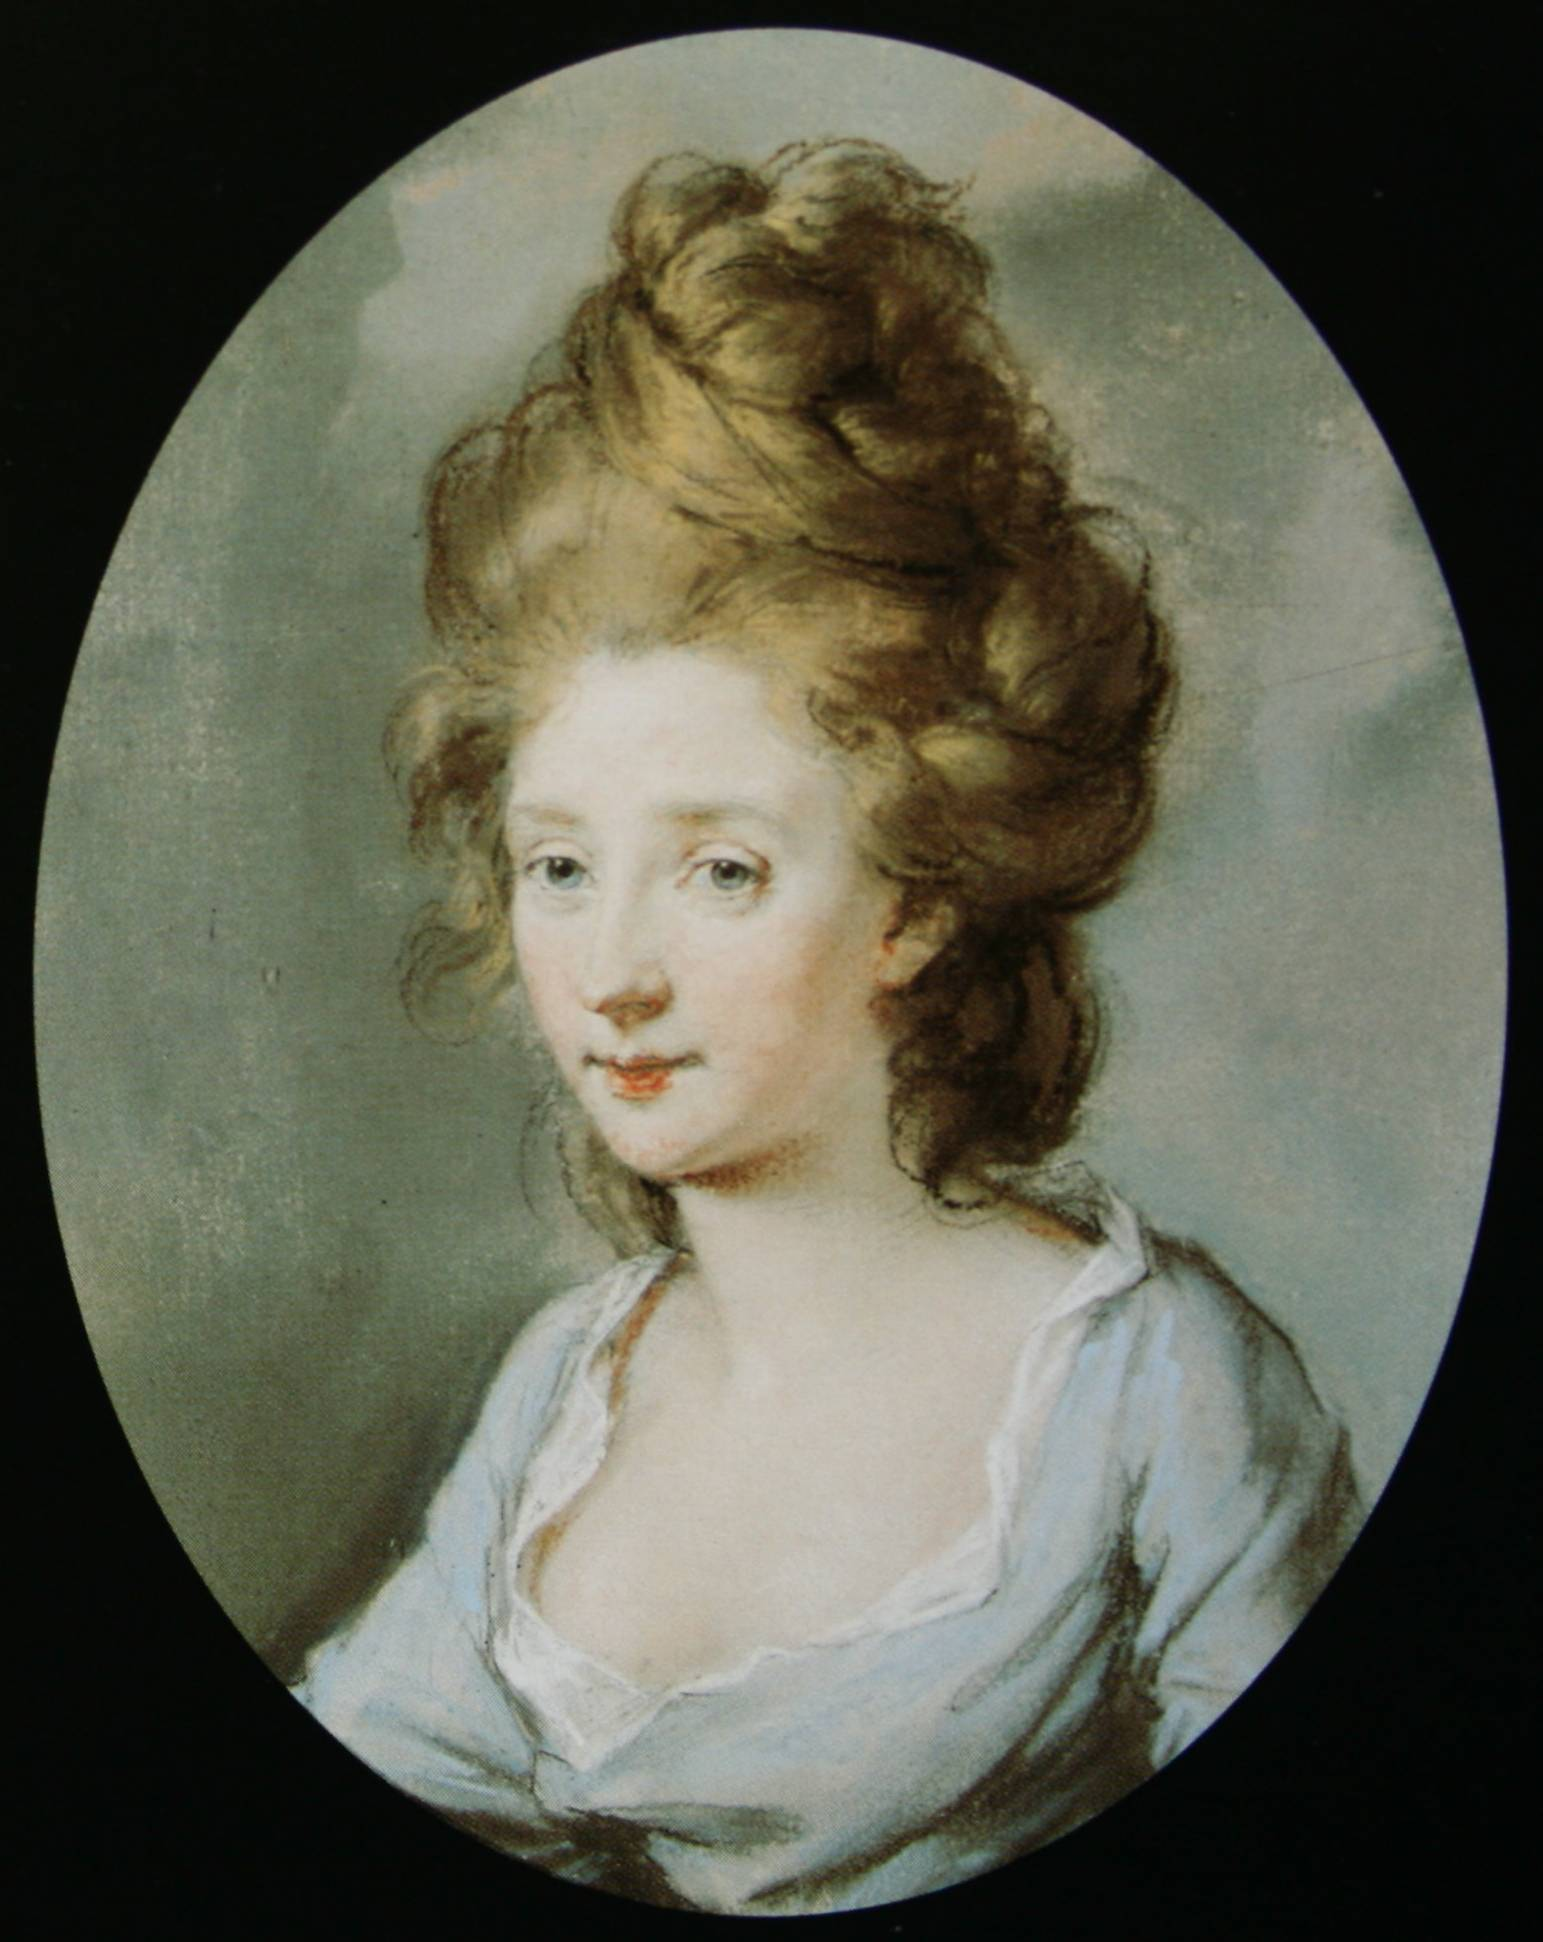 File:Henrietta molesworth.jpg - Wikimedia Commons